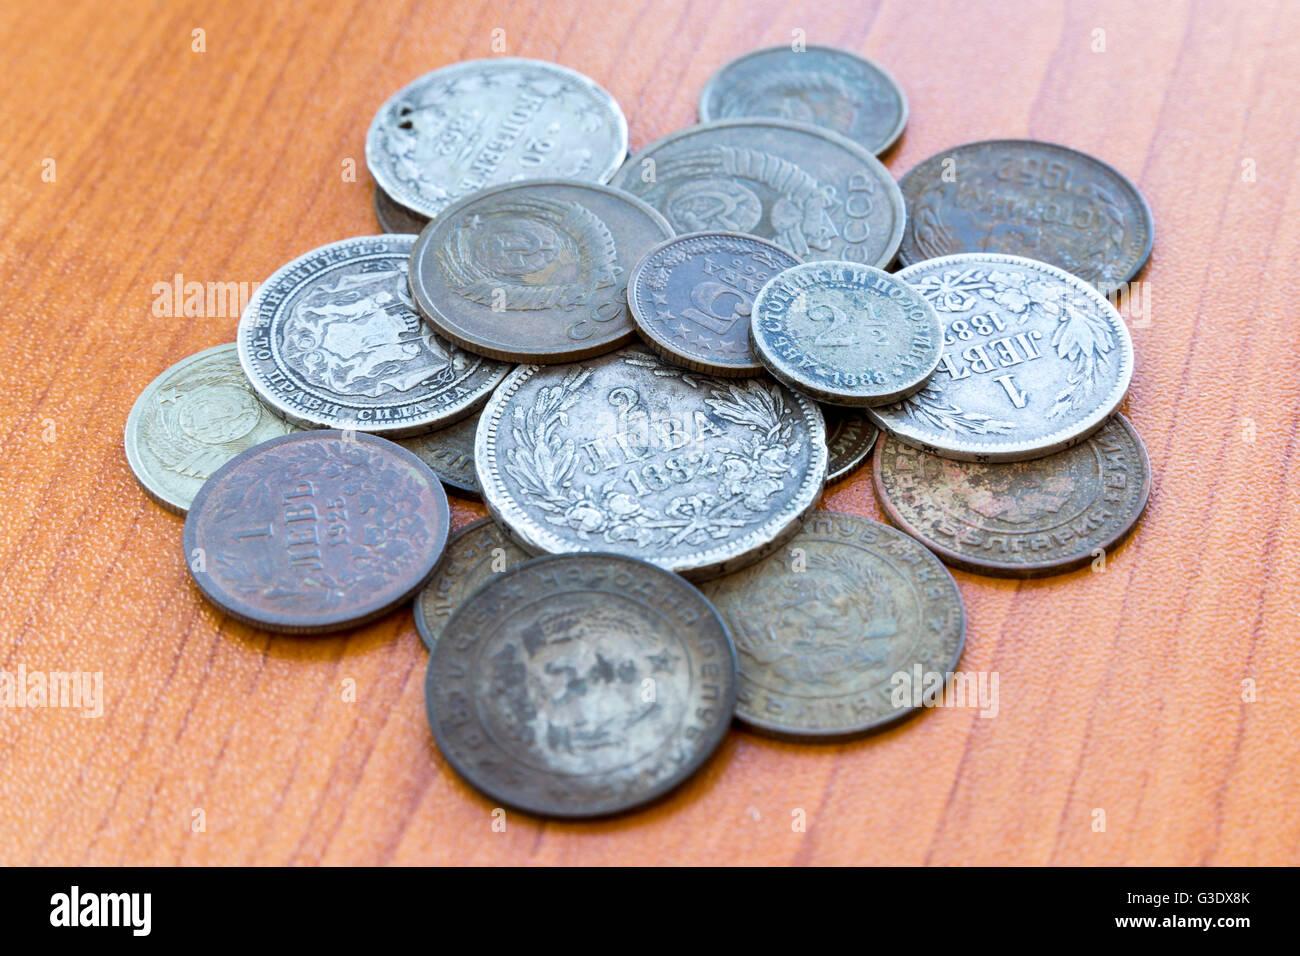 Silver coins, USSR coins. Old expired money. Bulgarian levas and Soviet Union Russian kopek, kopeck, copeck, kopeyka. Stock Photo